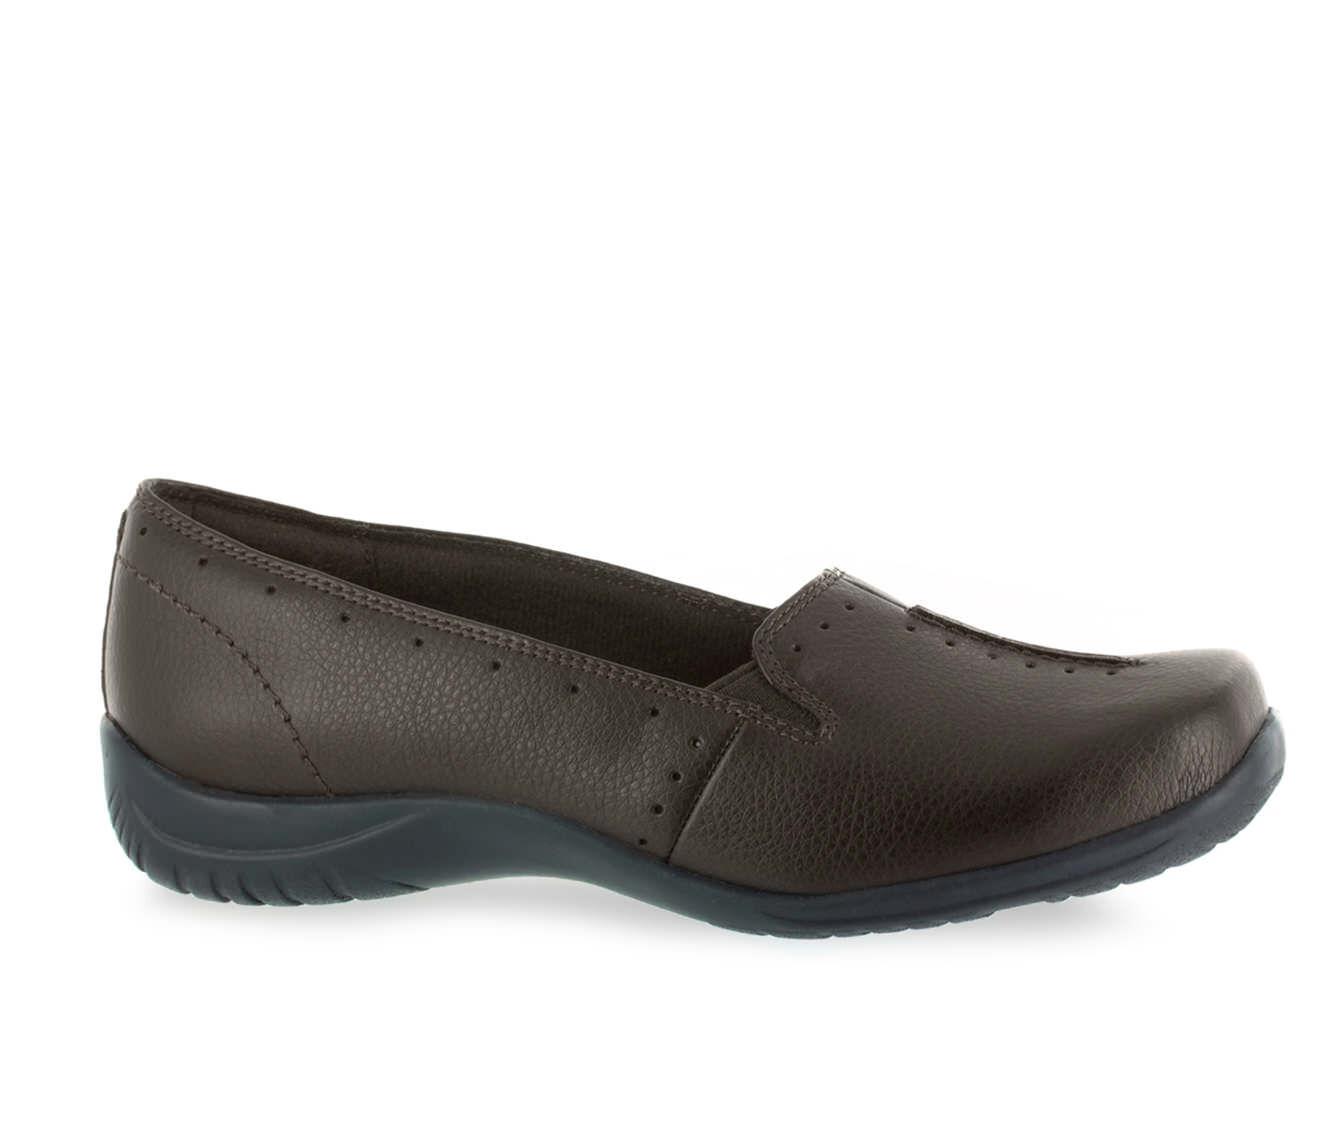 uk shoes_kd5757